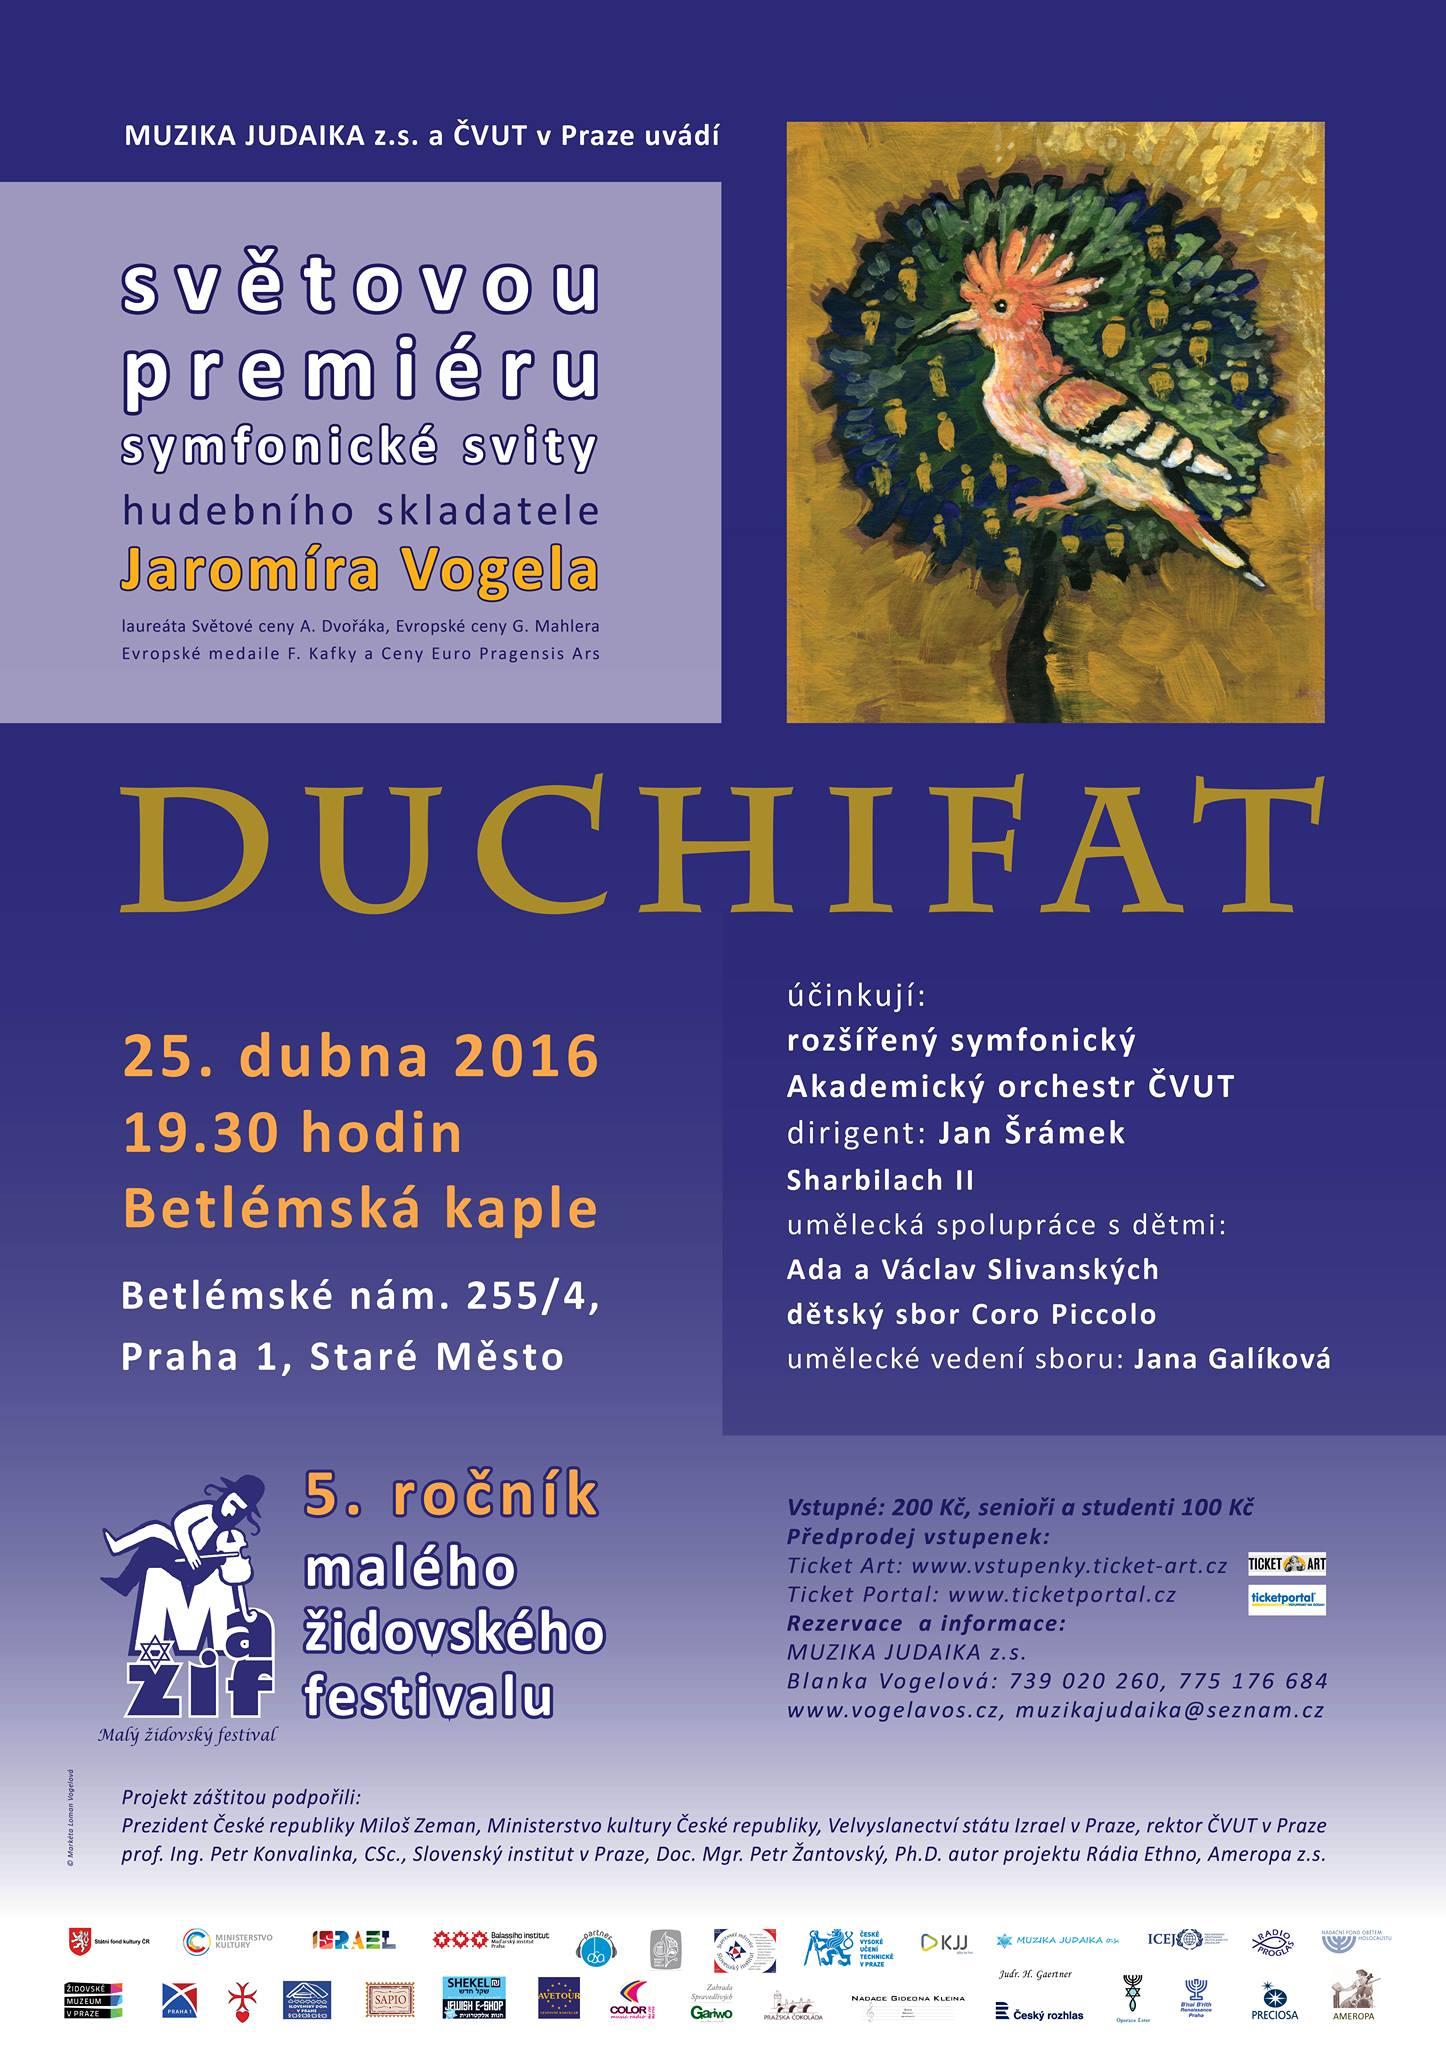 Duchifat